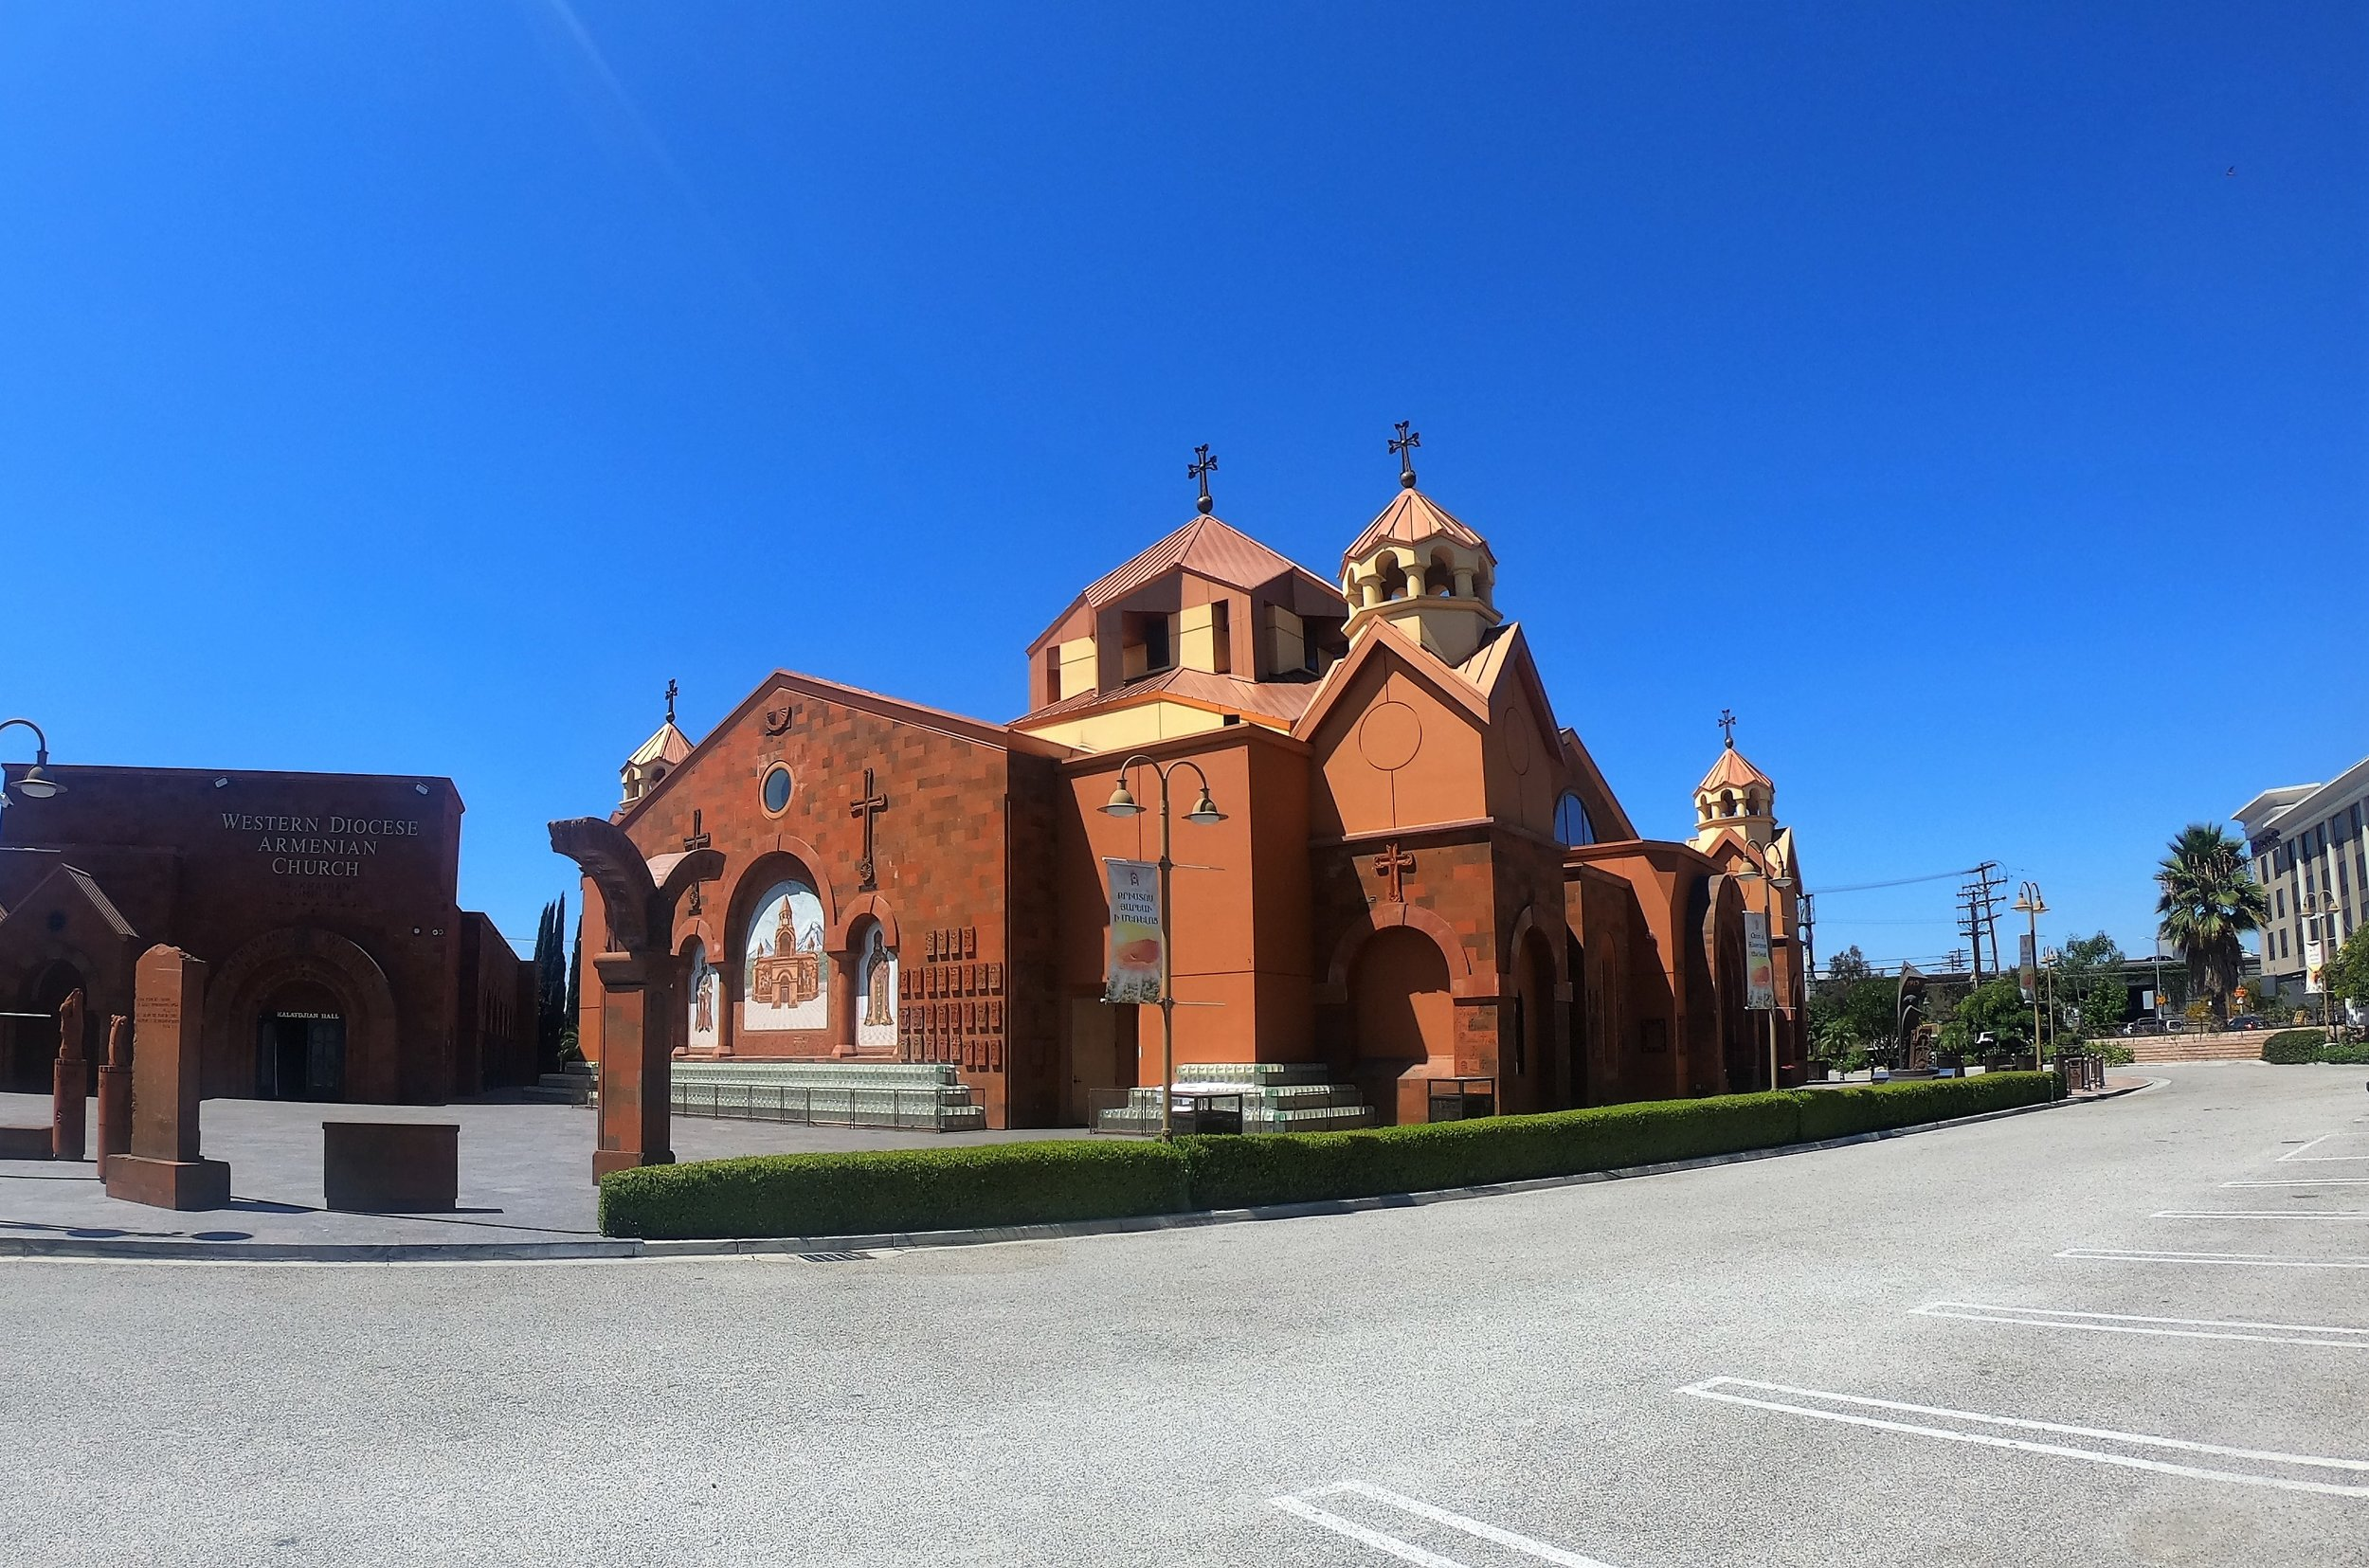 St. Leon Western Diocese Armenian Church in Burbank, California